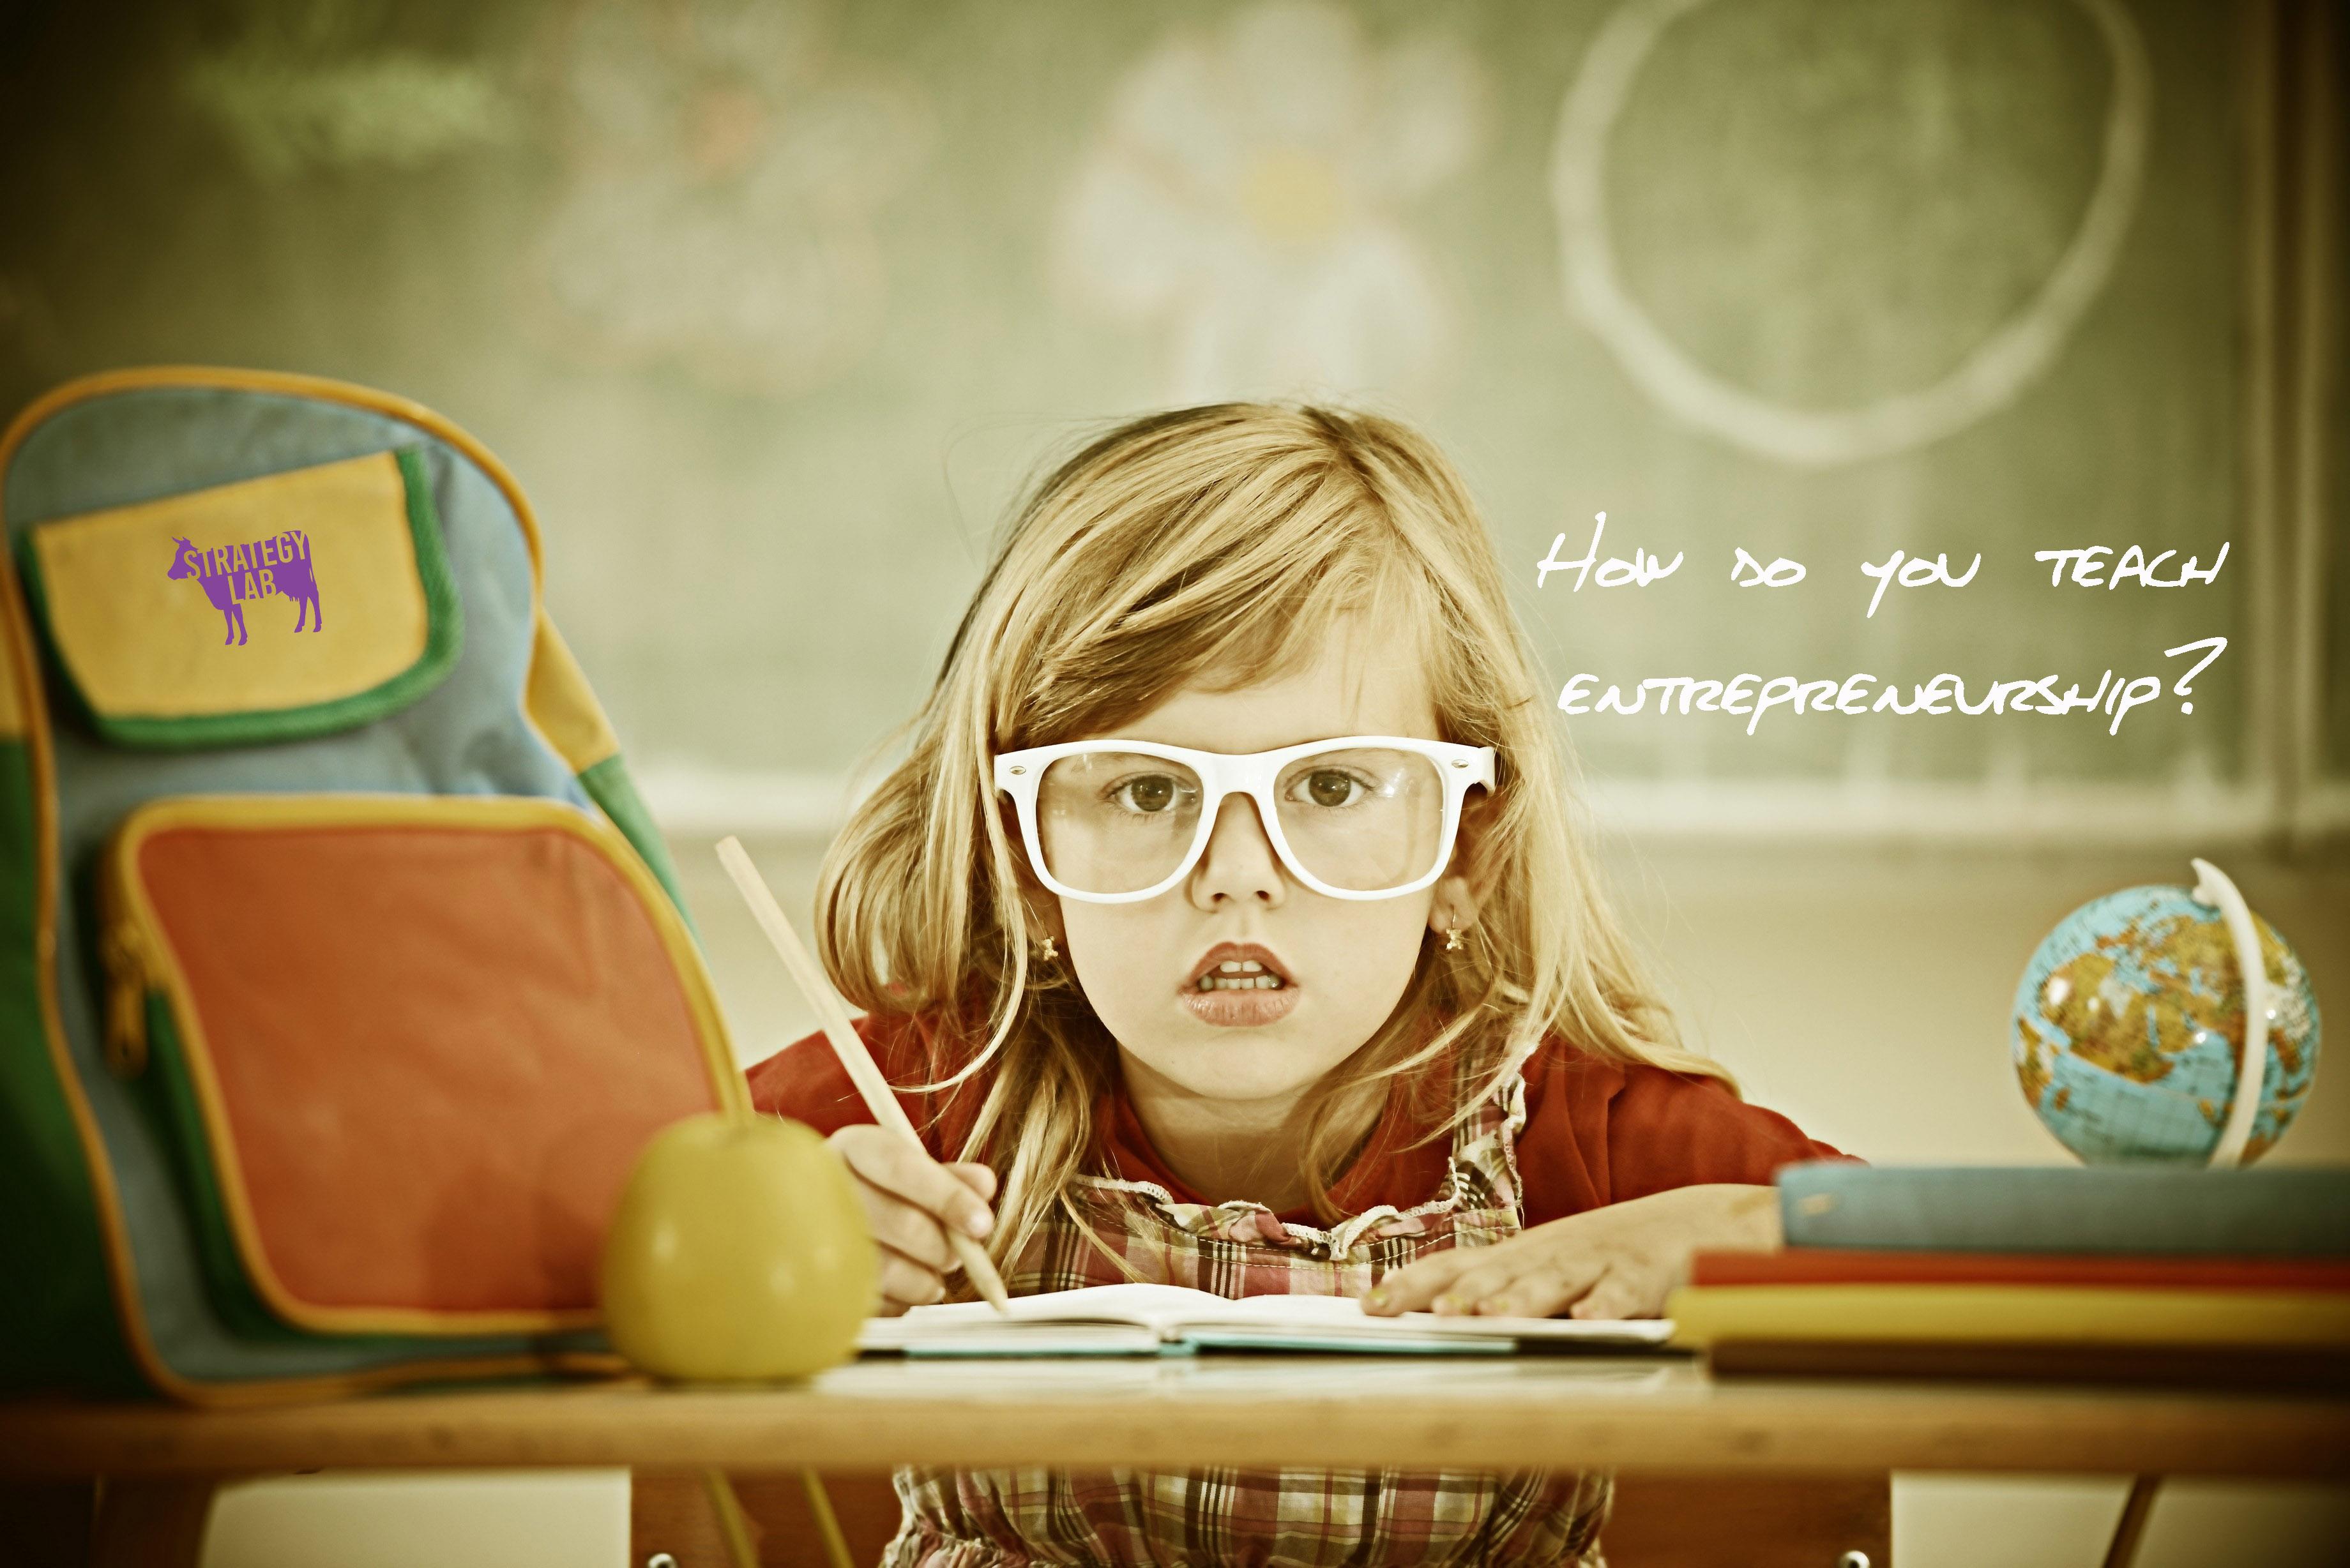 How do you teach entrepreneurship